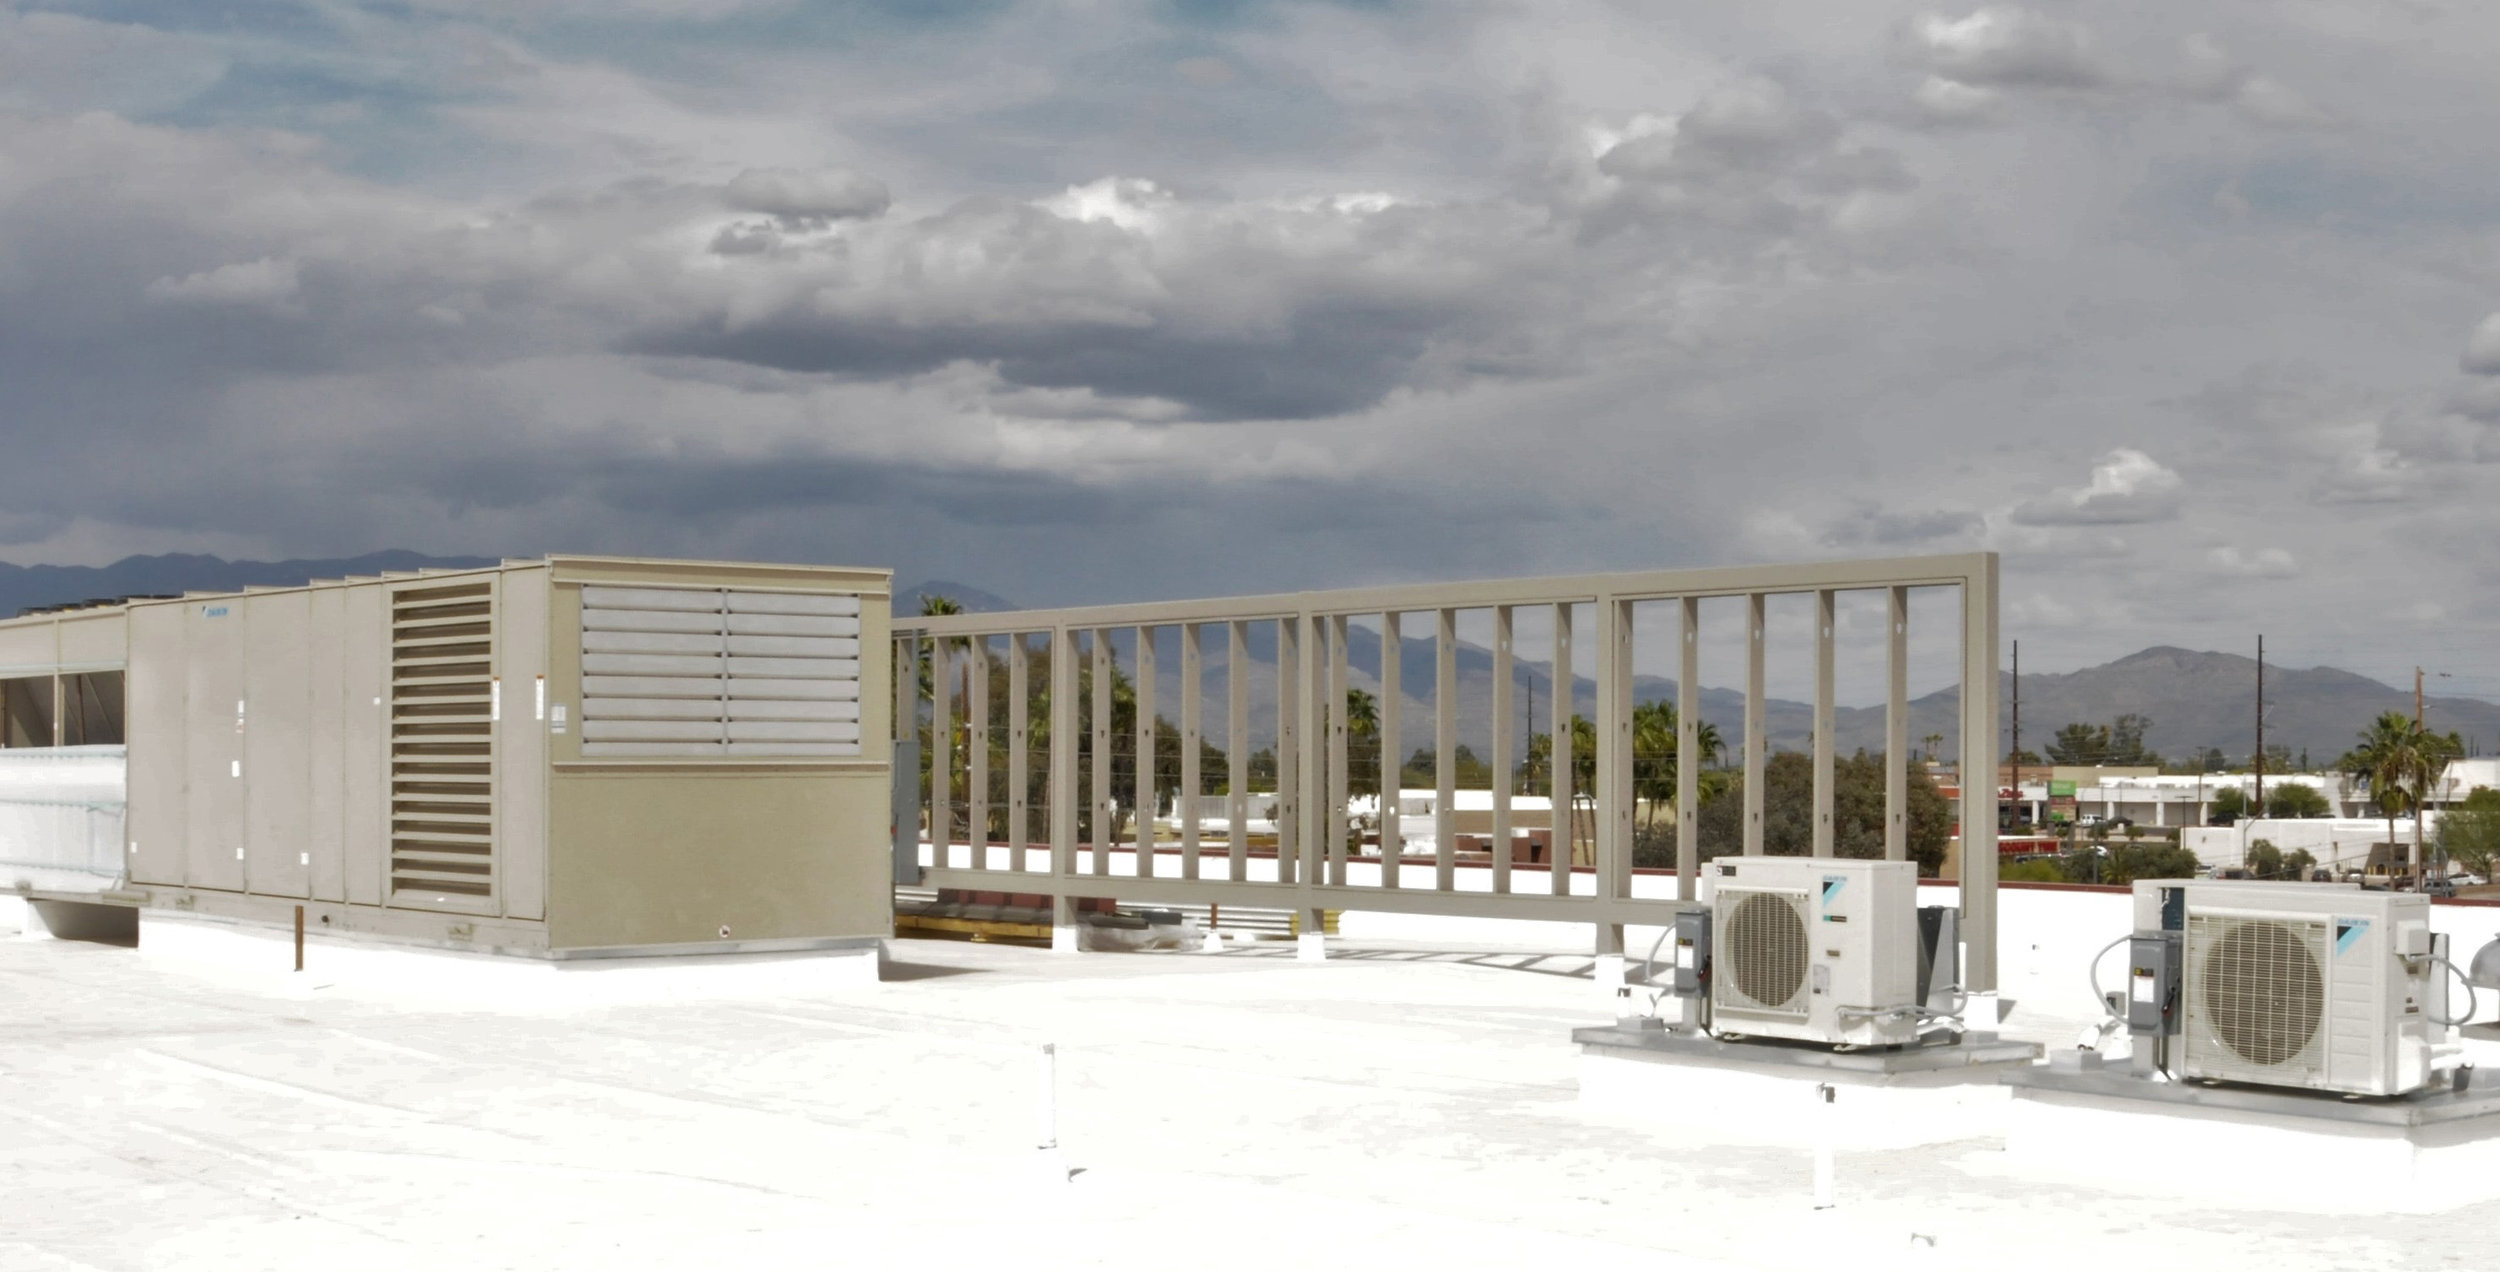 El Rio Medical Center General Contractor: Lloyd Construction Mechanical